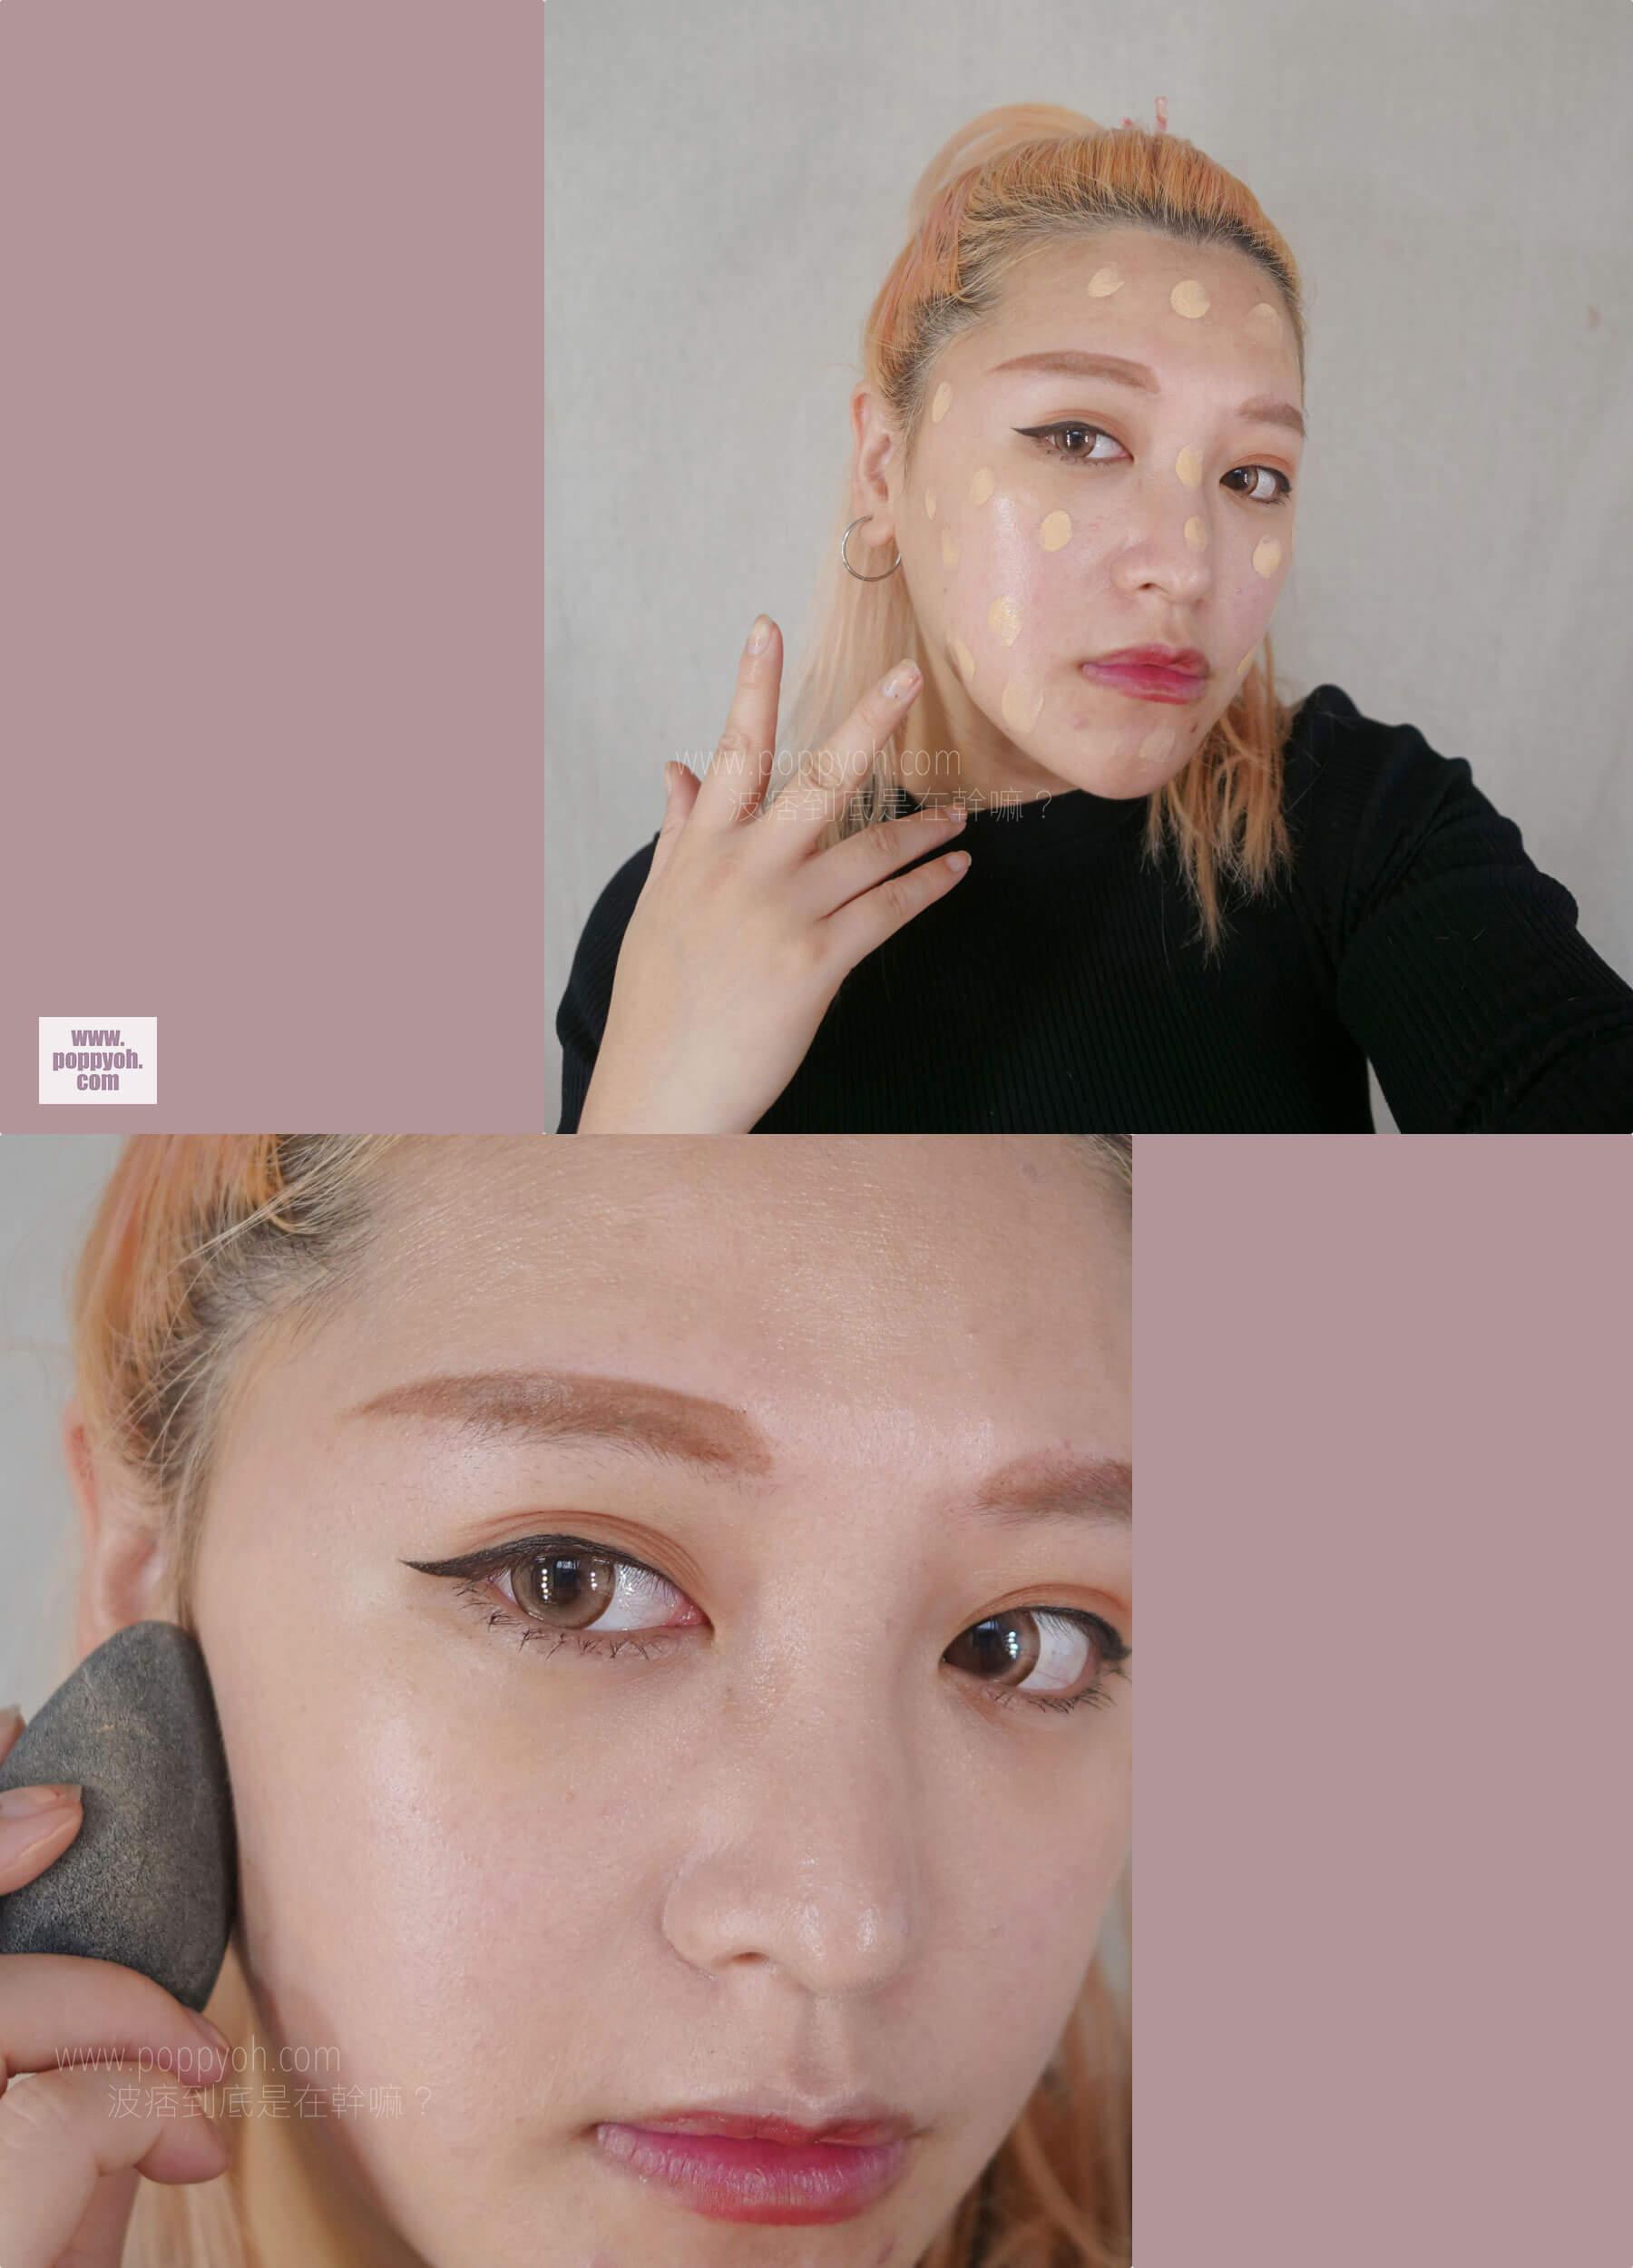 SOFINA蘇菲娜 漾緁輕妝綺肌長效粉底液進化版 妝效 妝感 持妝 控油